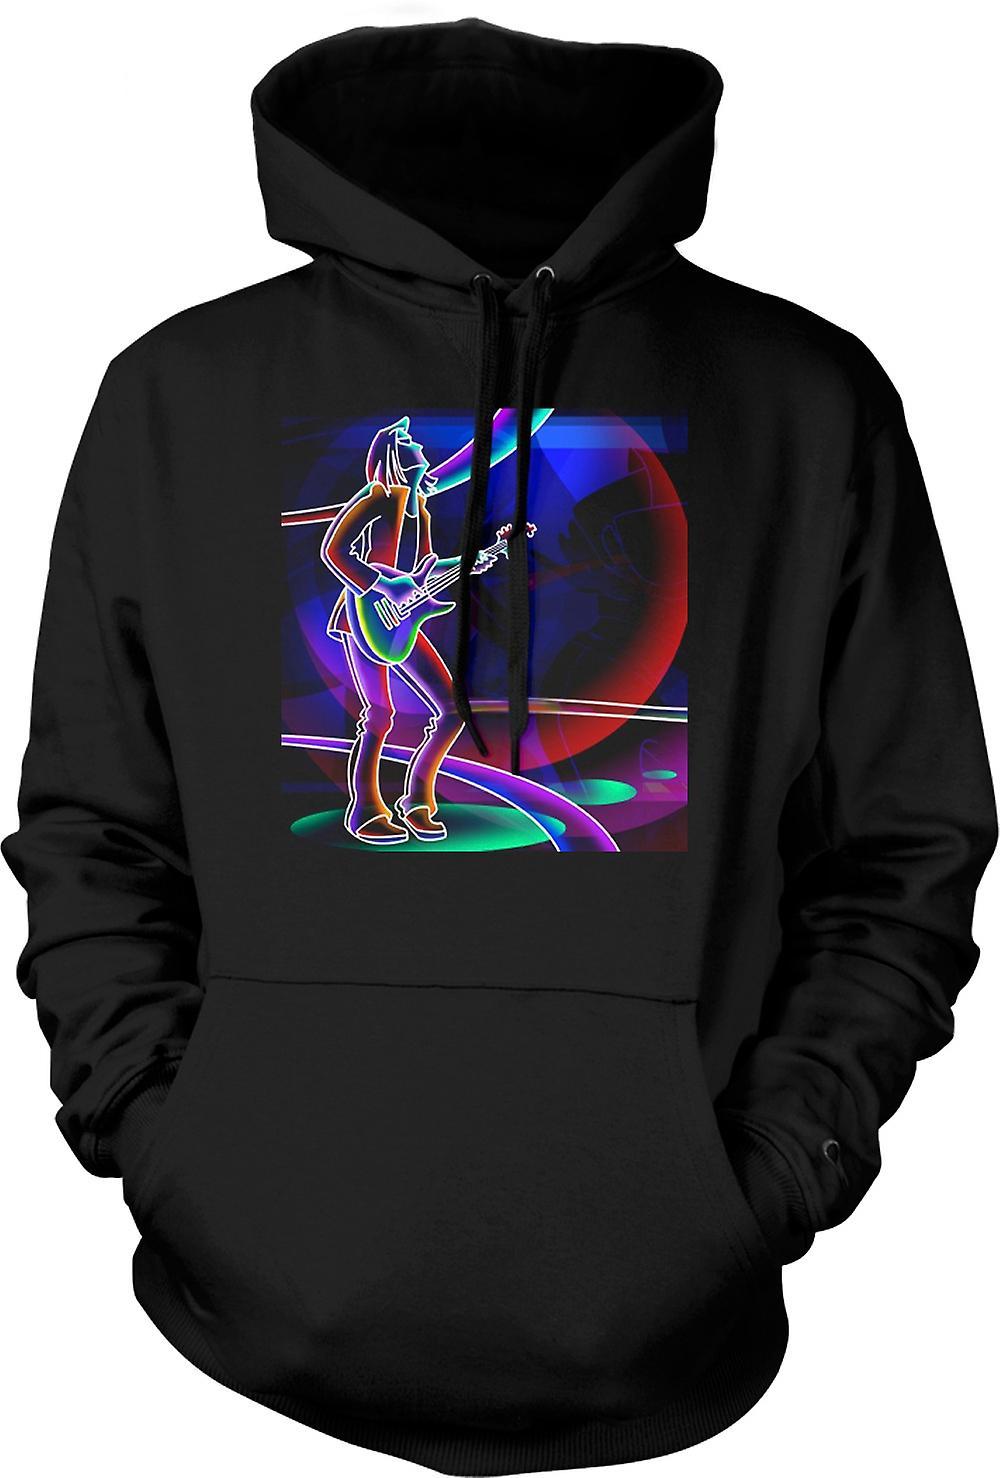 Mens Hoodie - Neon Rock Guitarist